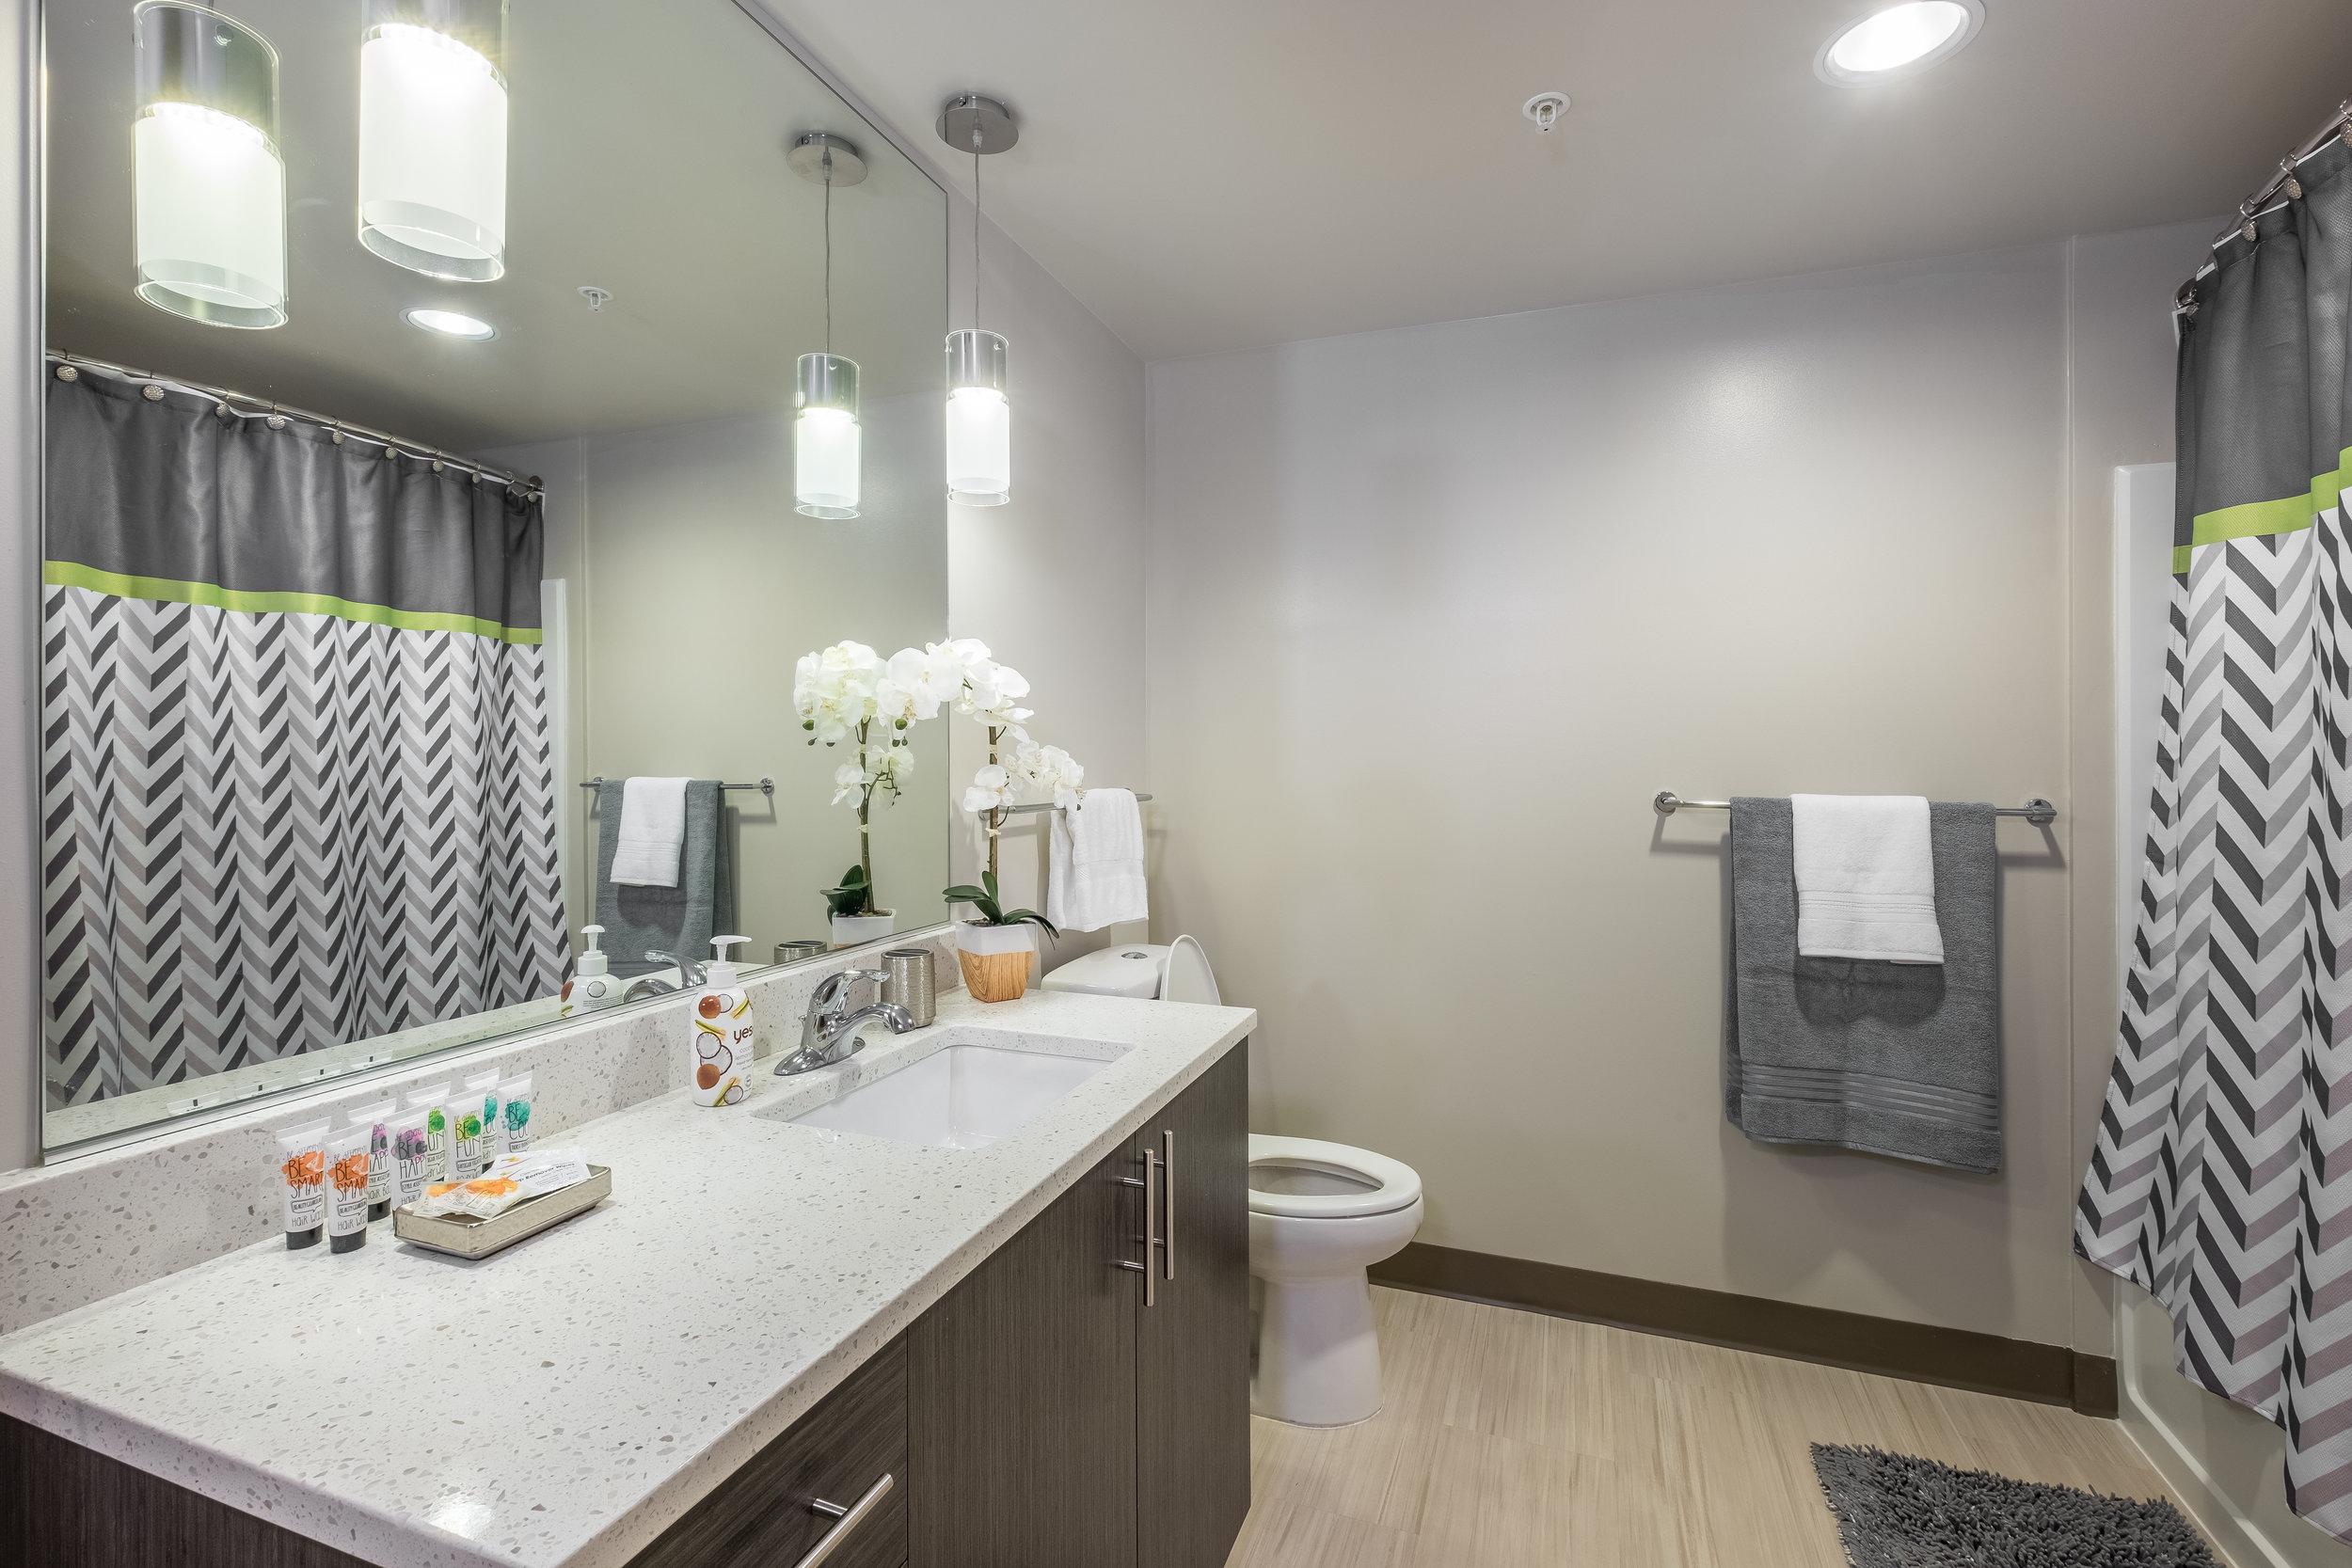 Short-Term/ Vacation Rental: Bathroom and Amenities Furnishing